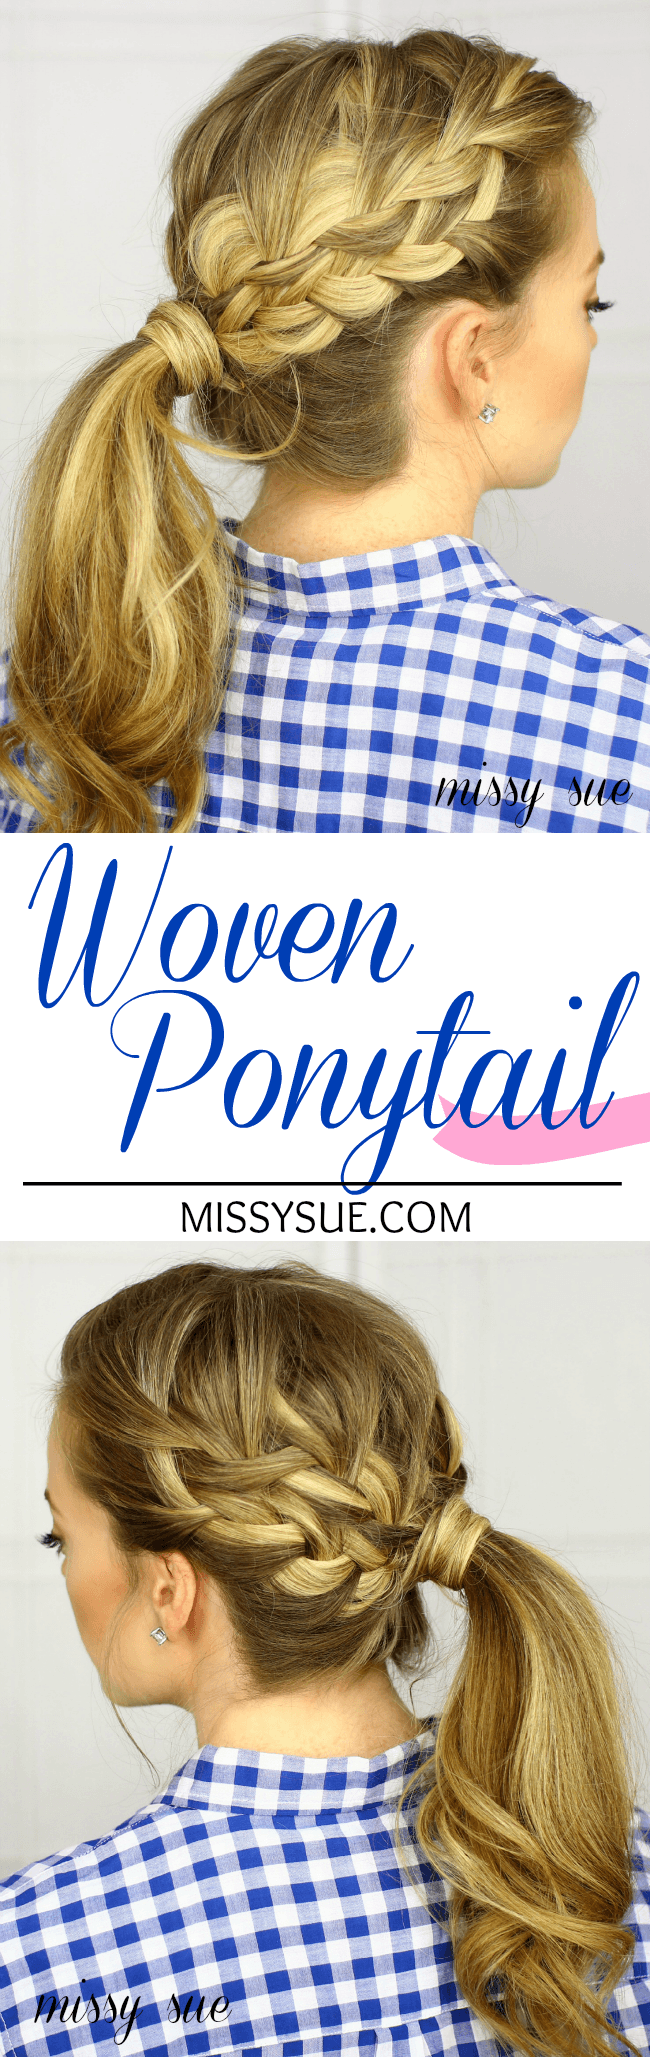 Woven Ponytail Tutorial